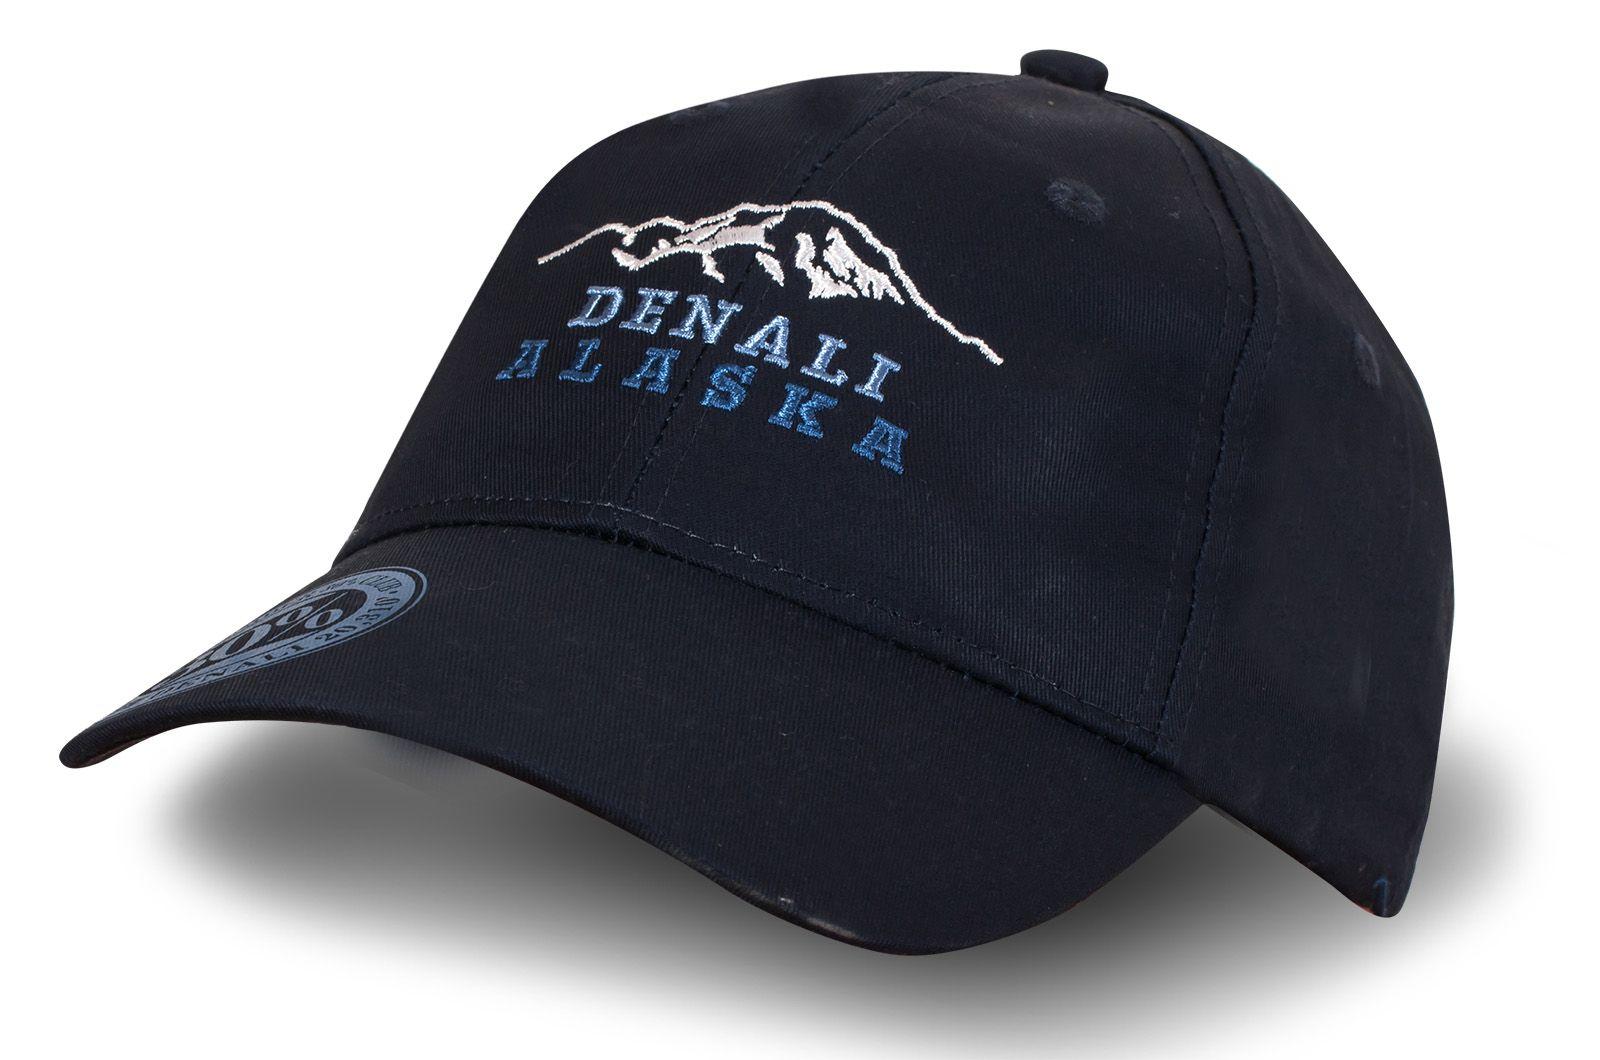 Бейсболка Denali Alaska